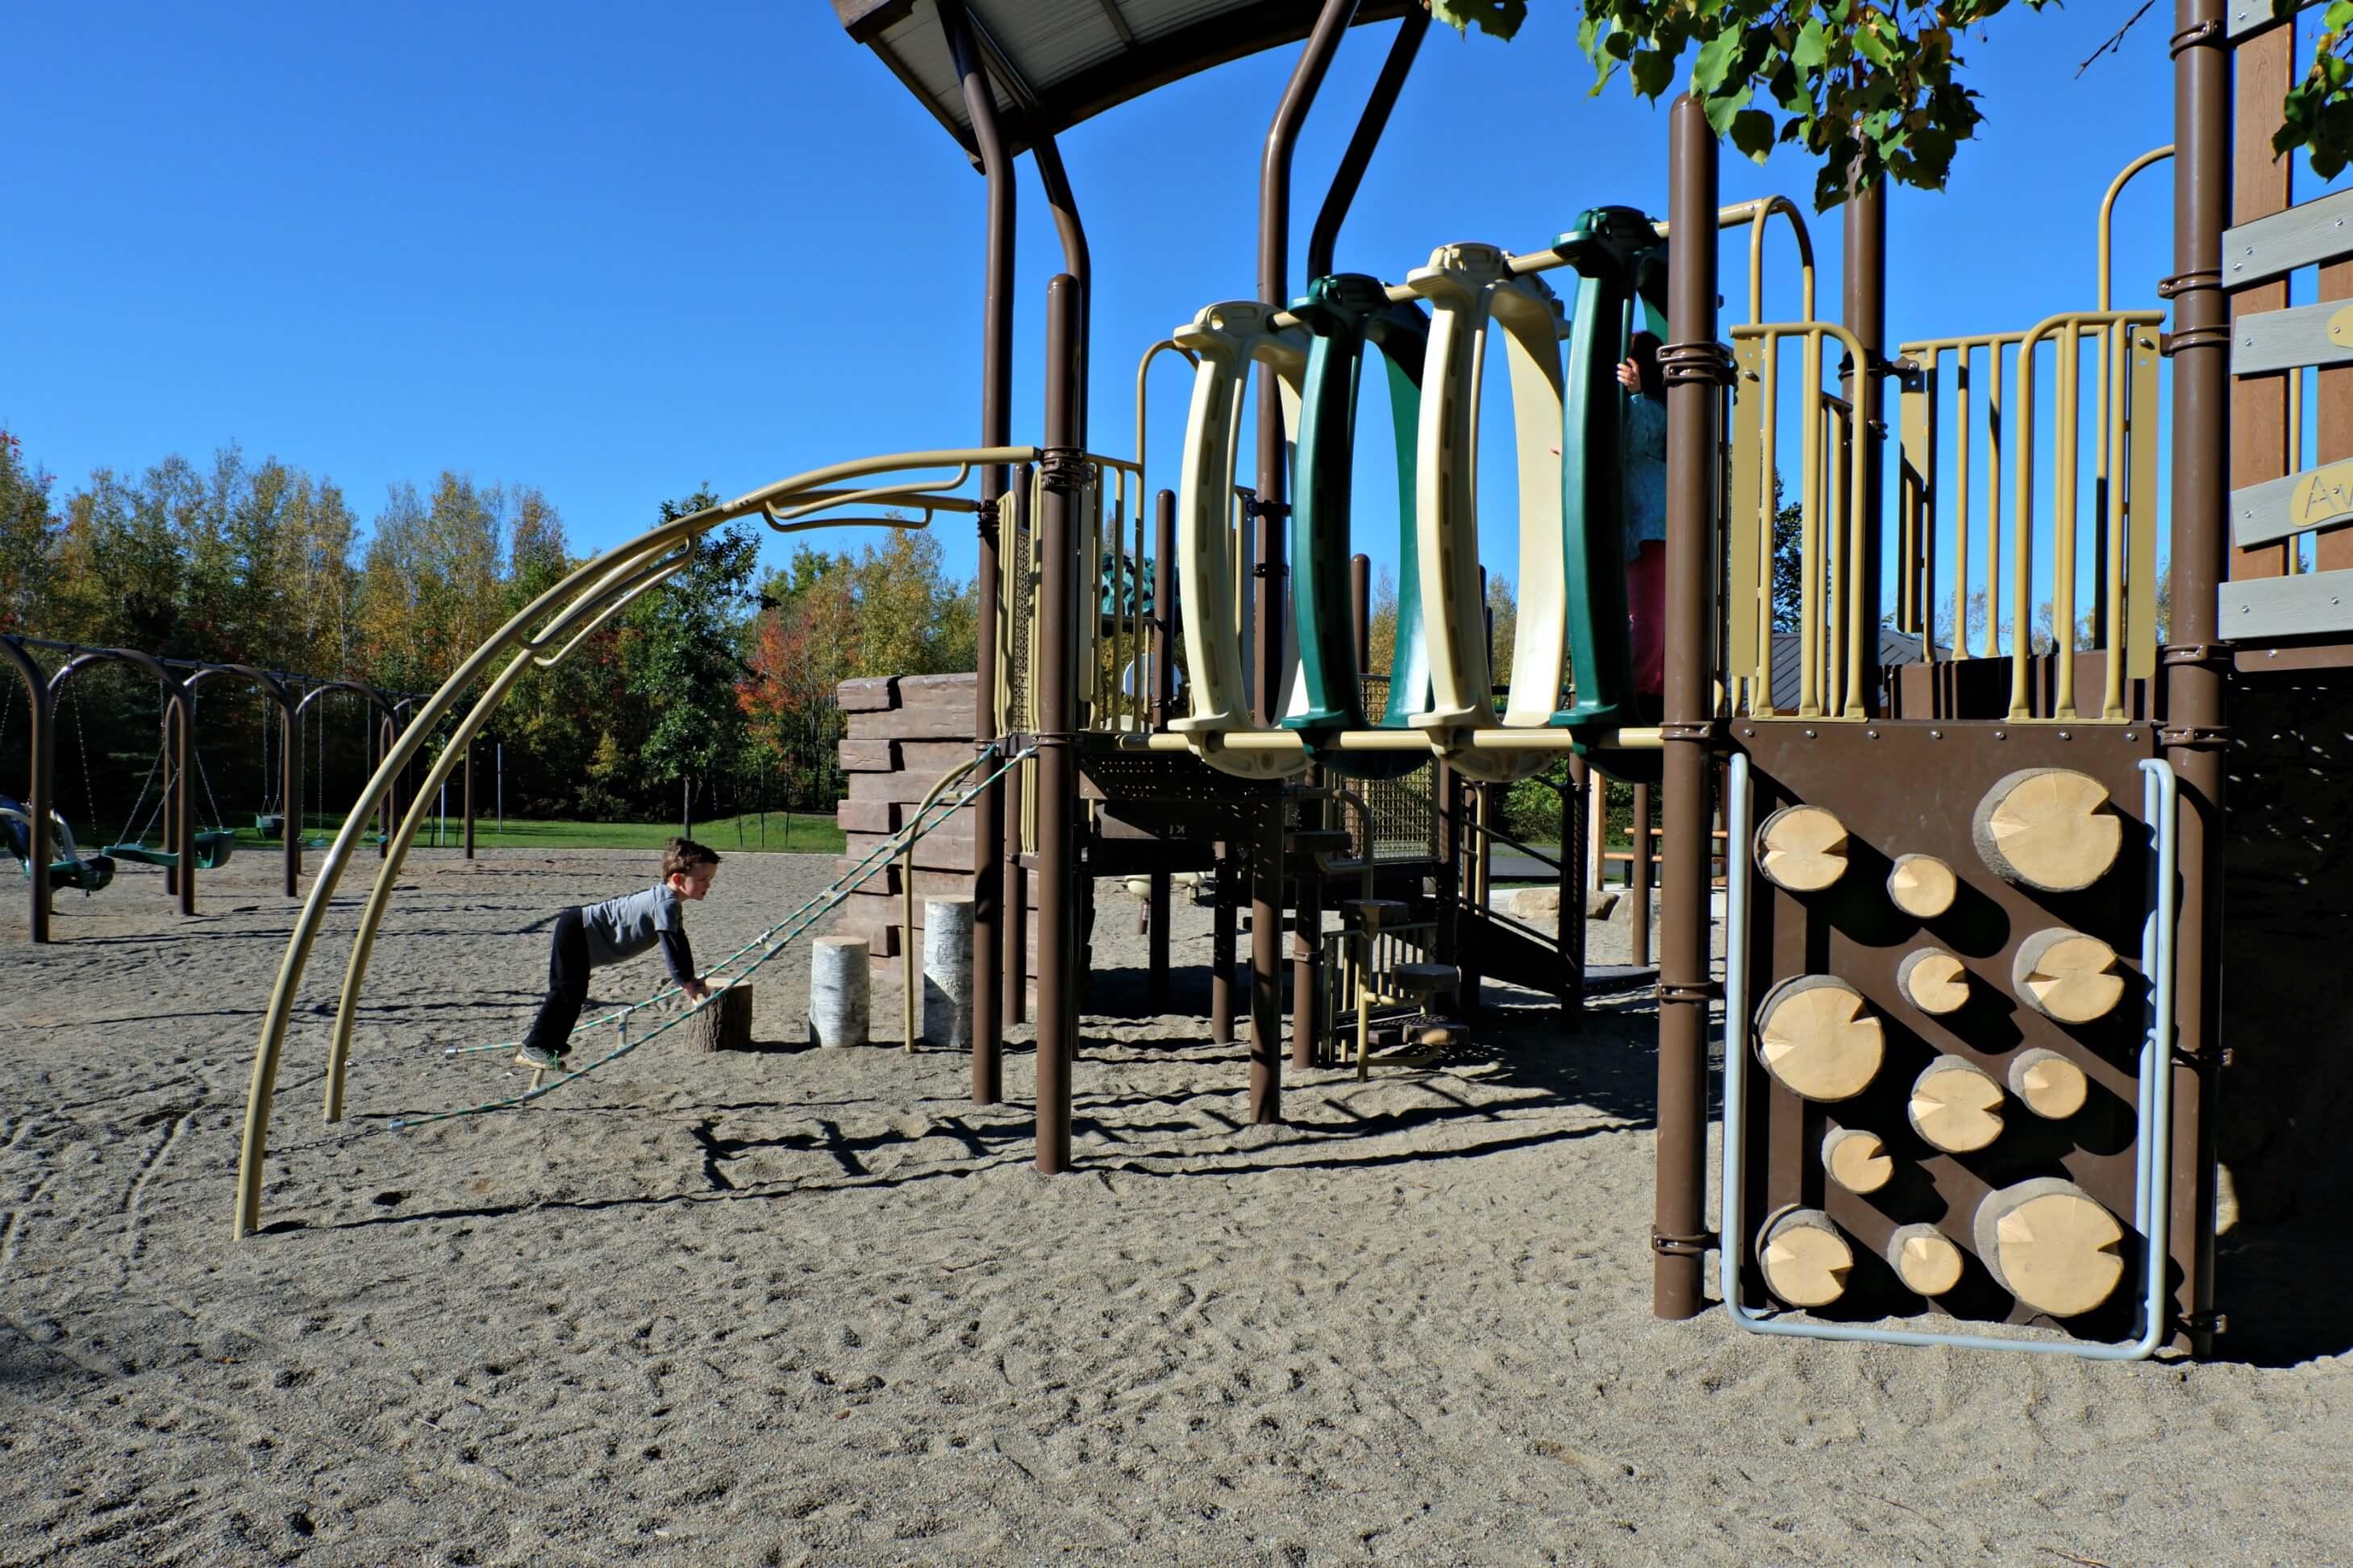 maplehurst park playground moncton riverview dieppe best play new brunswick climbing